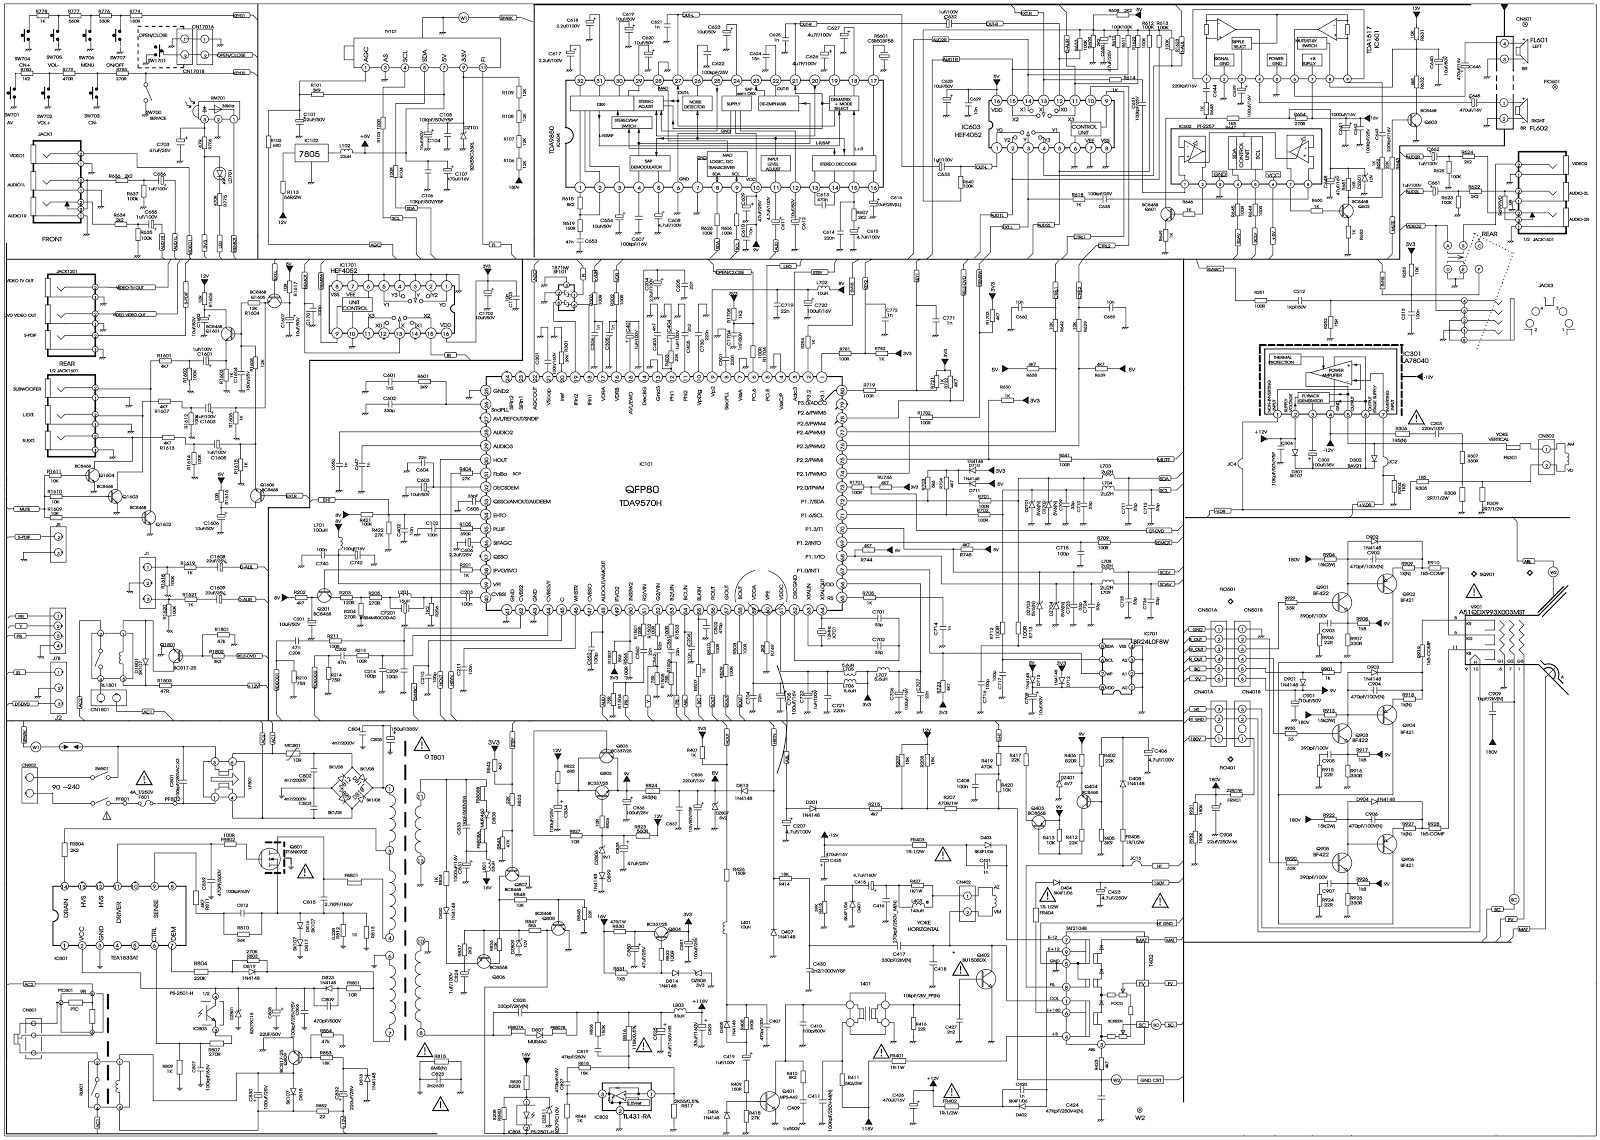 Bluesky Tvd 290fs Tv Dvd Crt Type Circuit Diagram